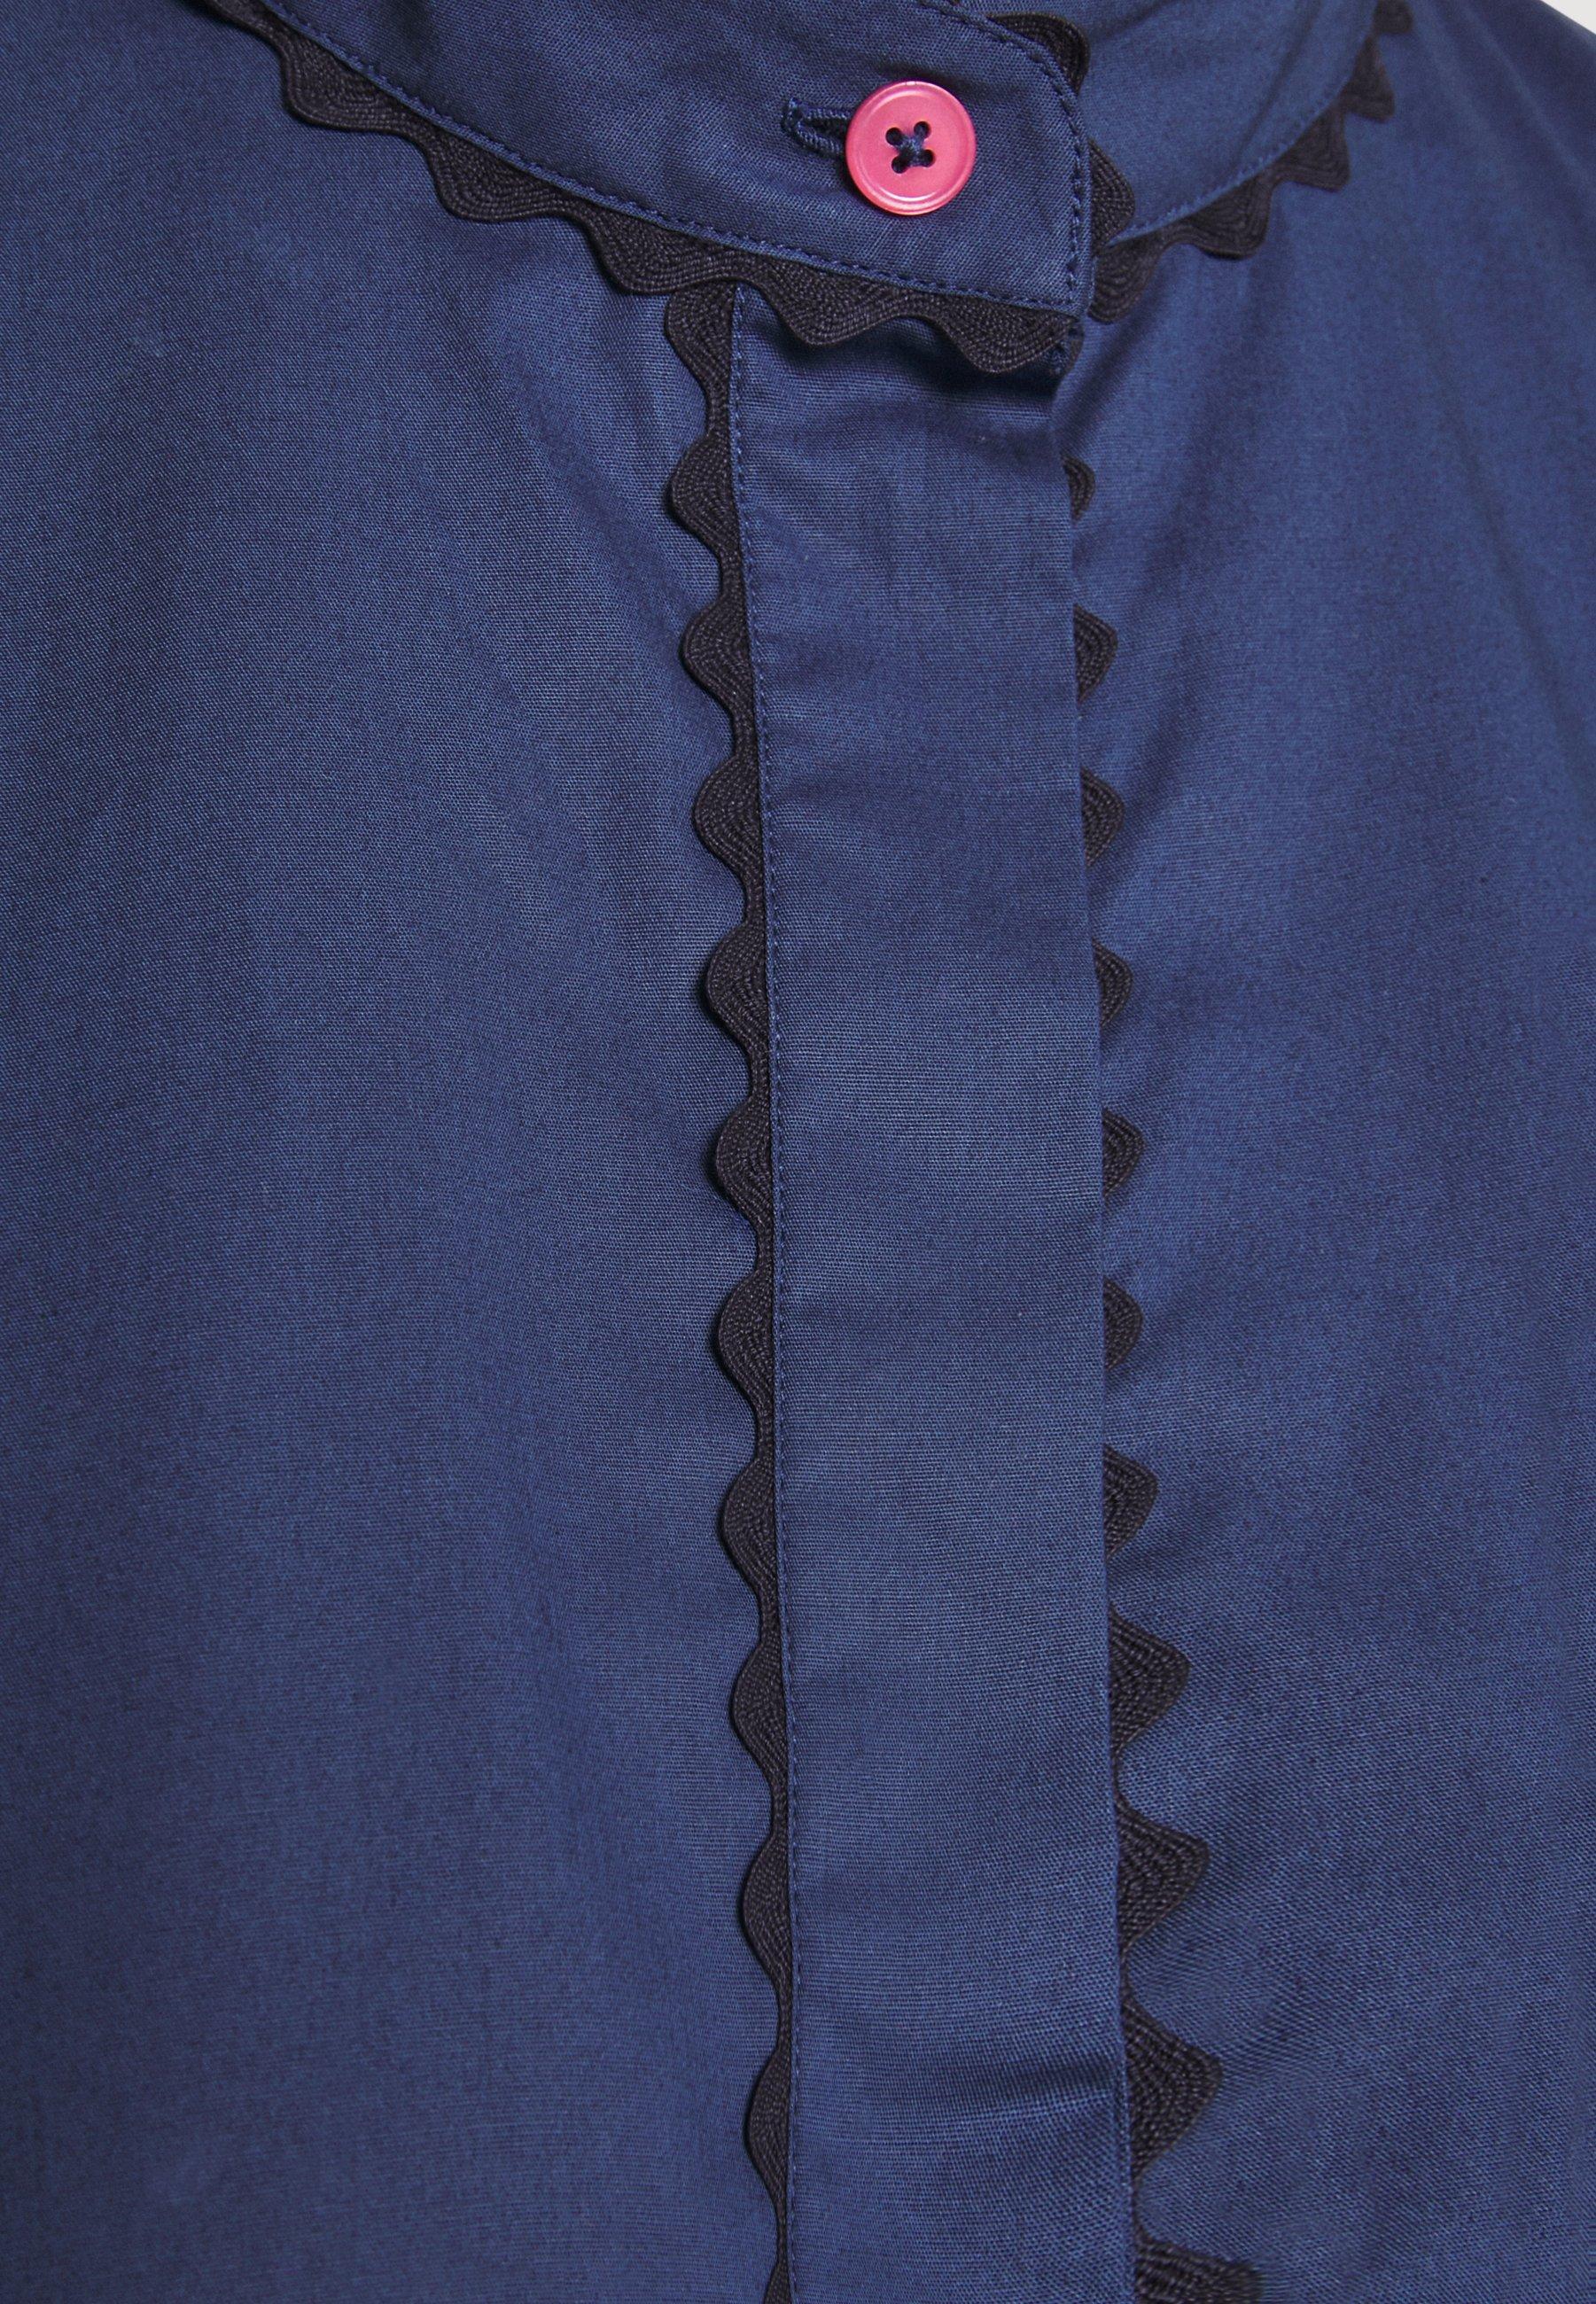 Best Supplier Women's Clothing PS Paul Smith Day dress dark blue nzwGIklDa